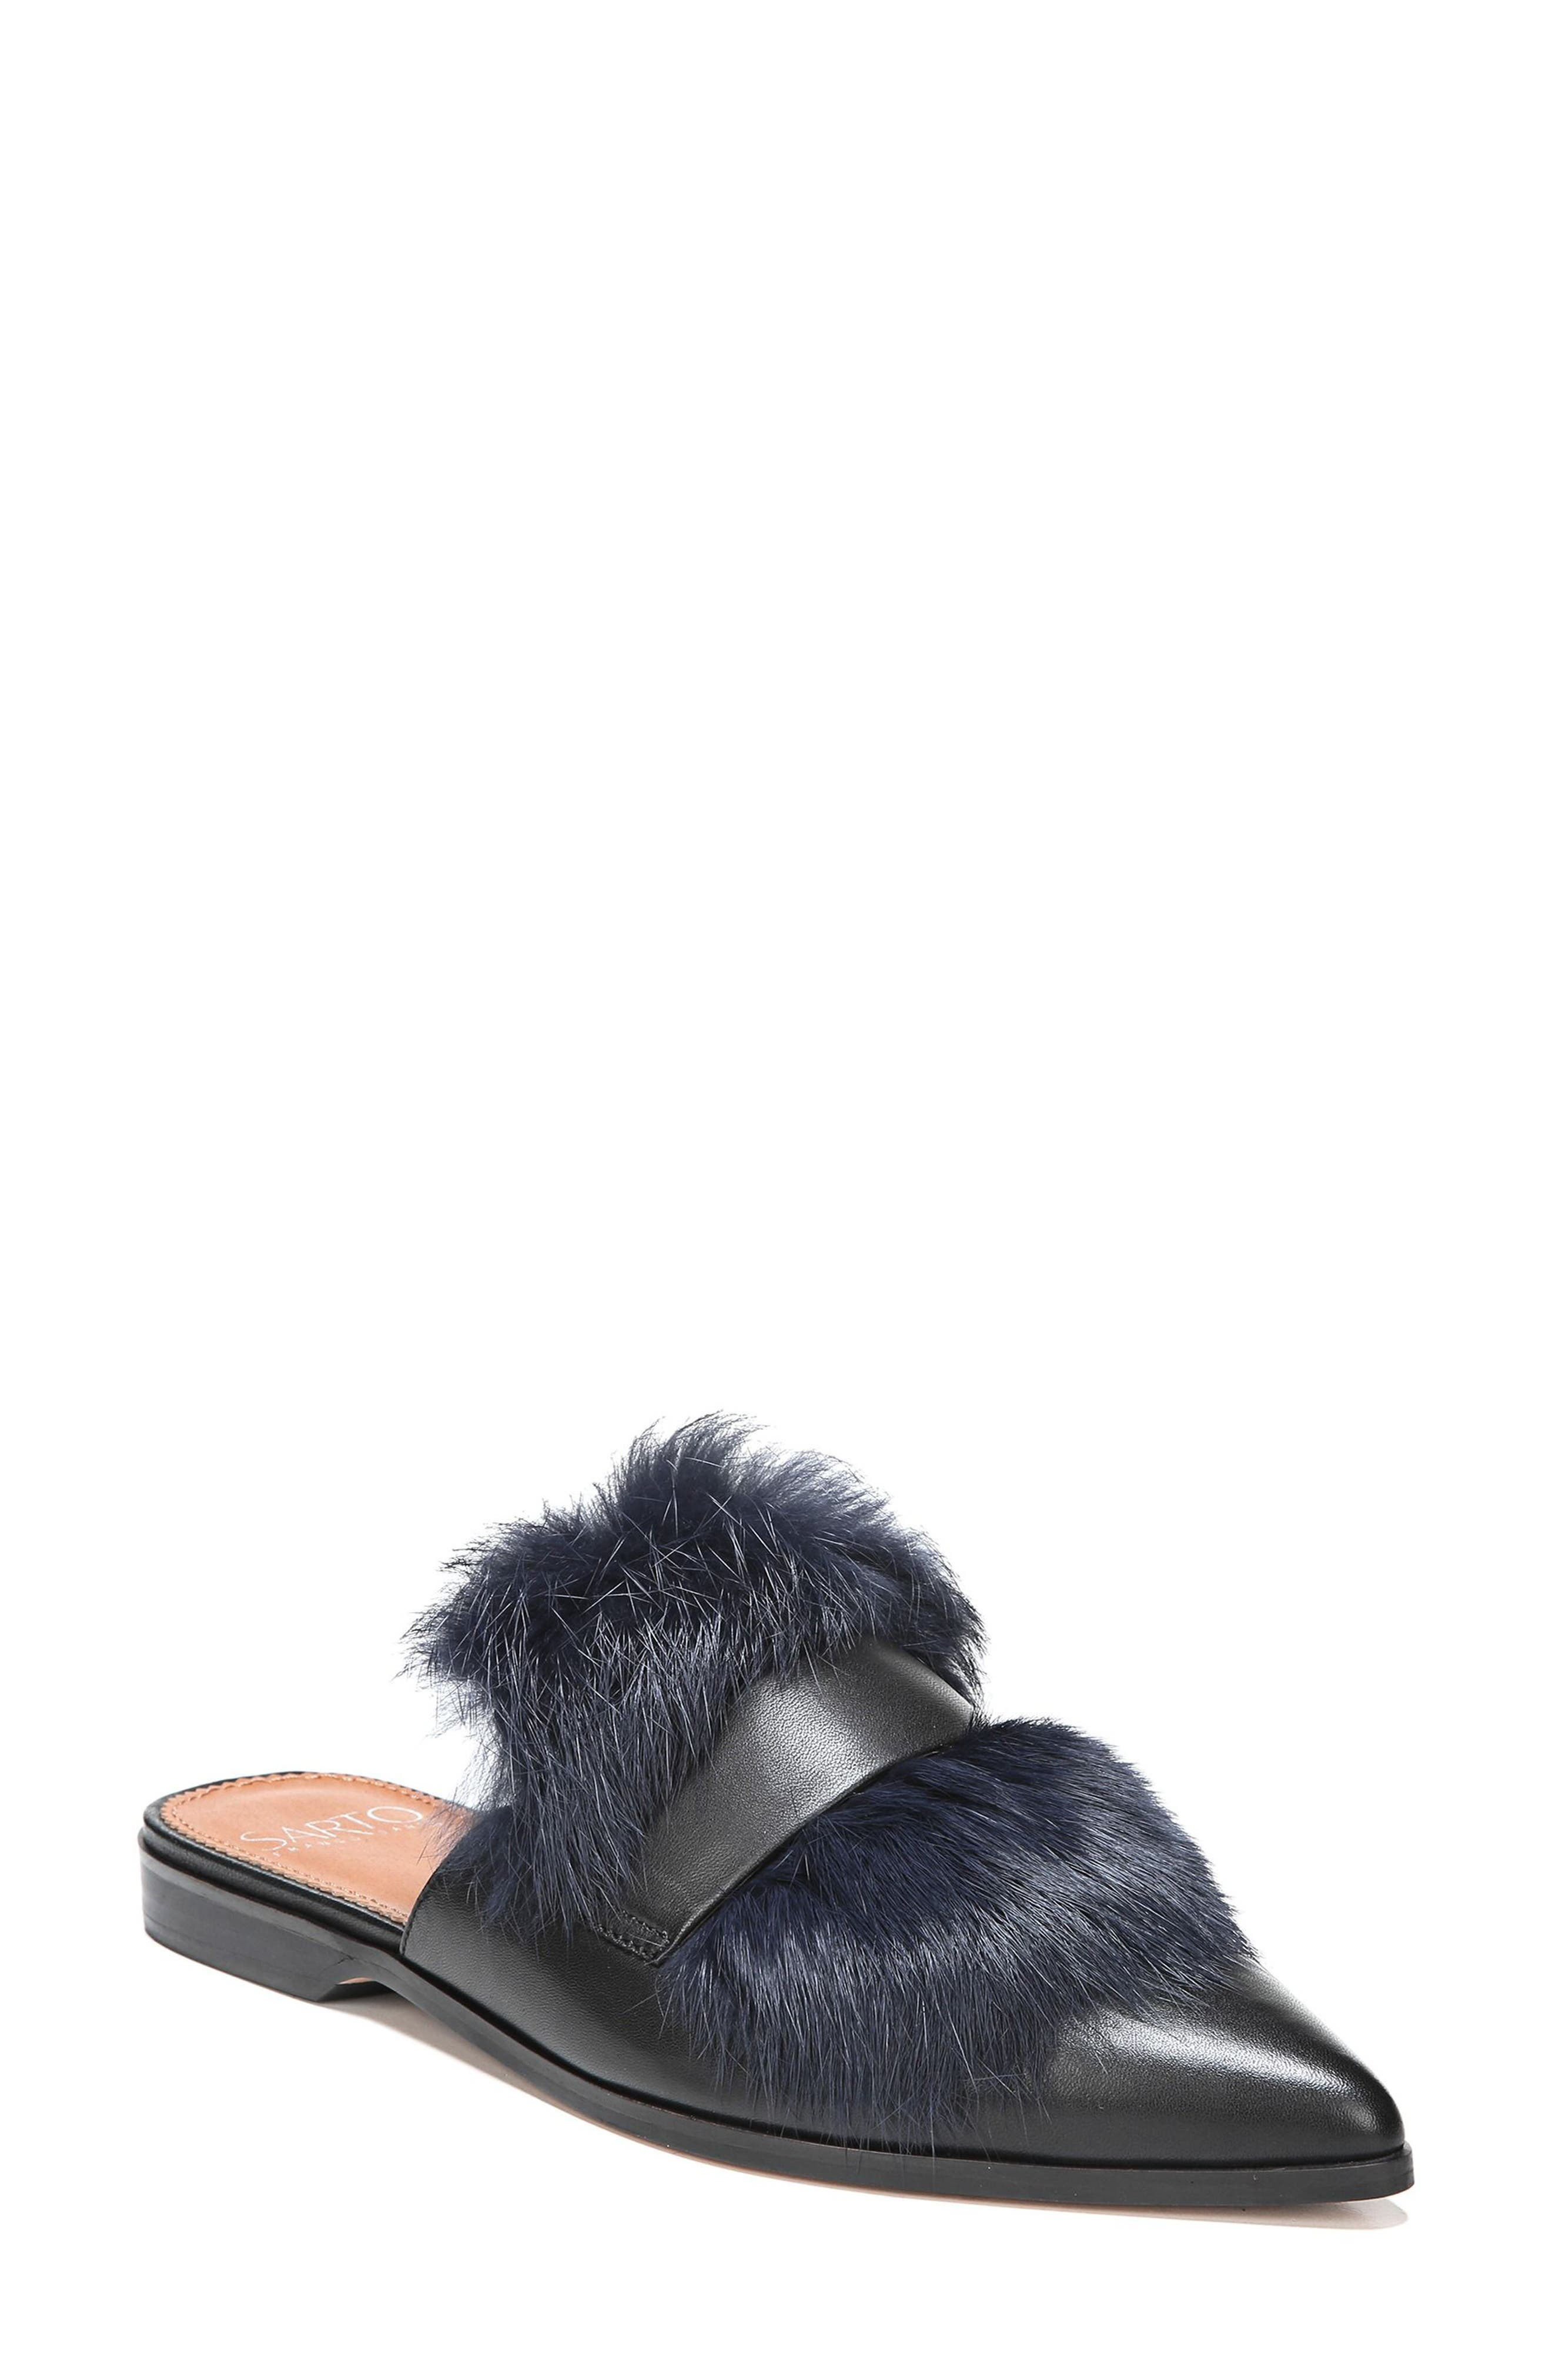 Palmer II Genuine Rabbit Fur Slide,                             Main thumbnail 1, color,                             001